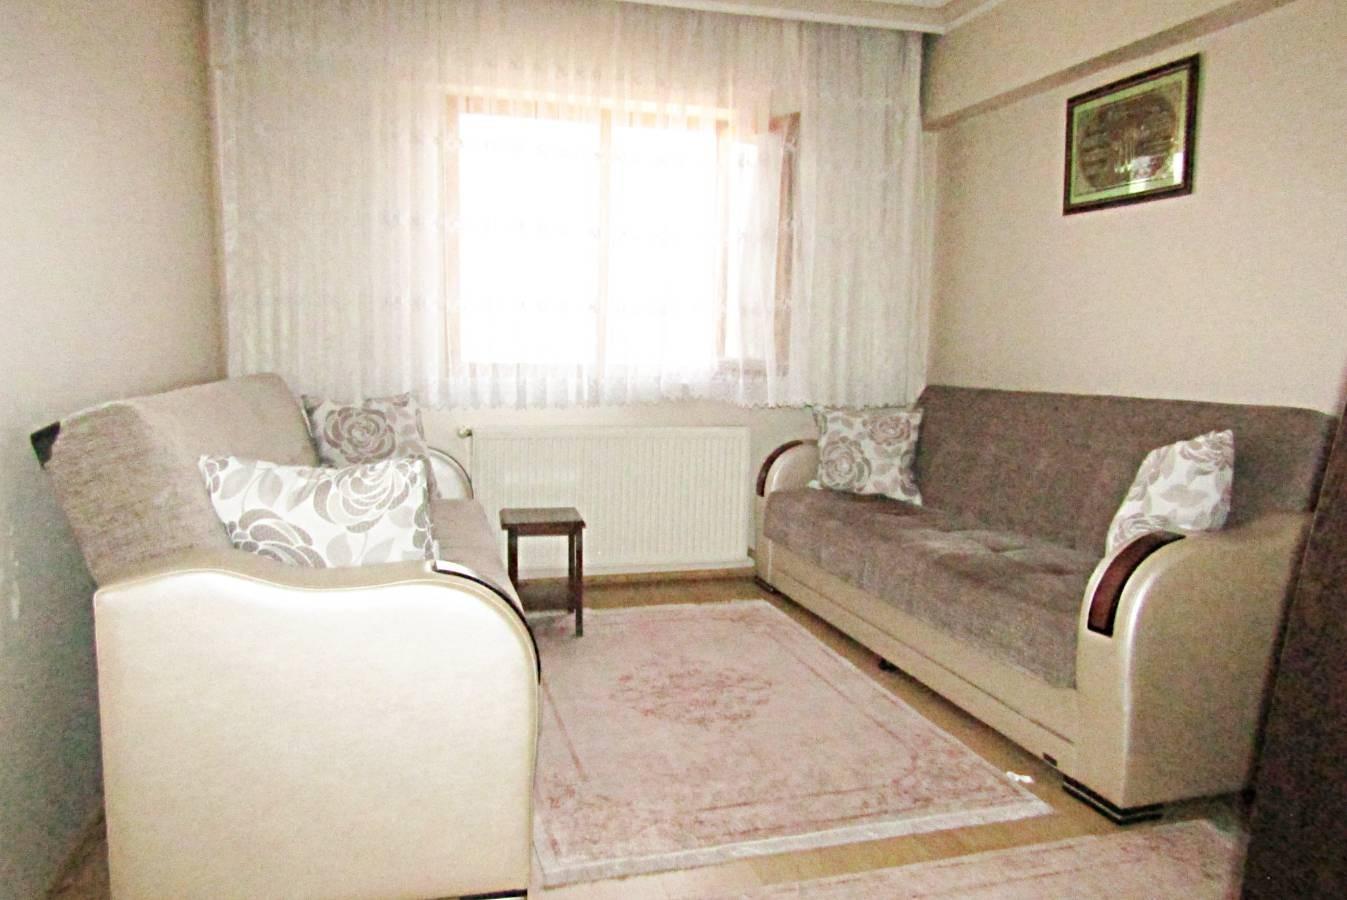 SR EMLAK'TAN ALSANCAK MAH'DE 3+1 115 m²  ÖN CEPHE KATTA  MANZARALI  DAİRE